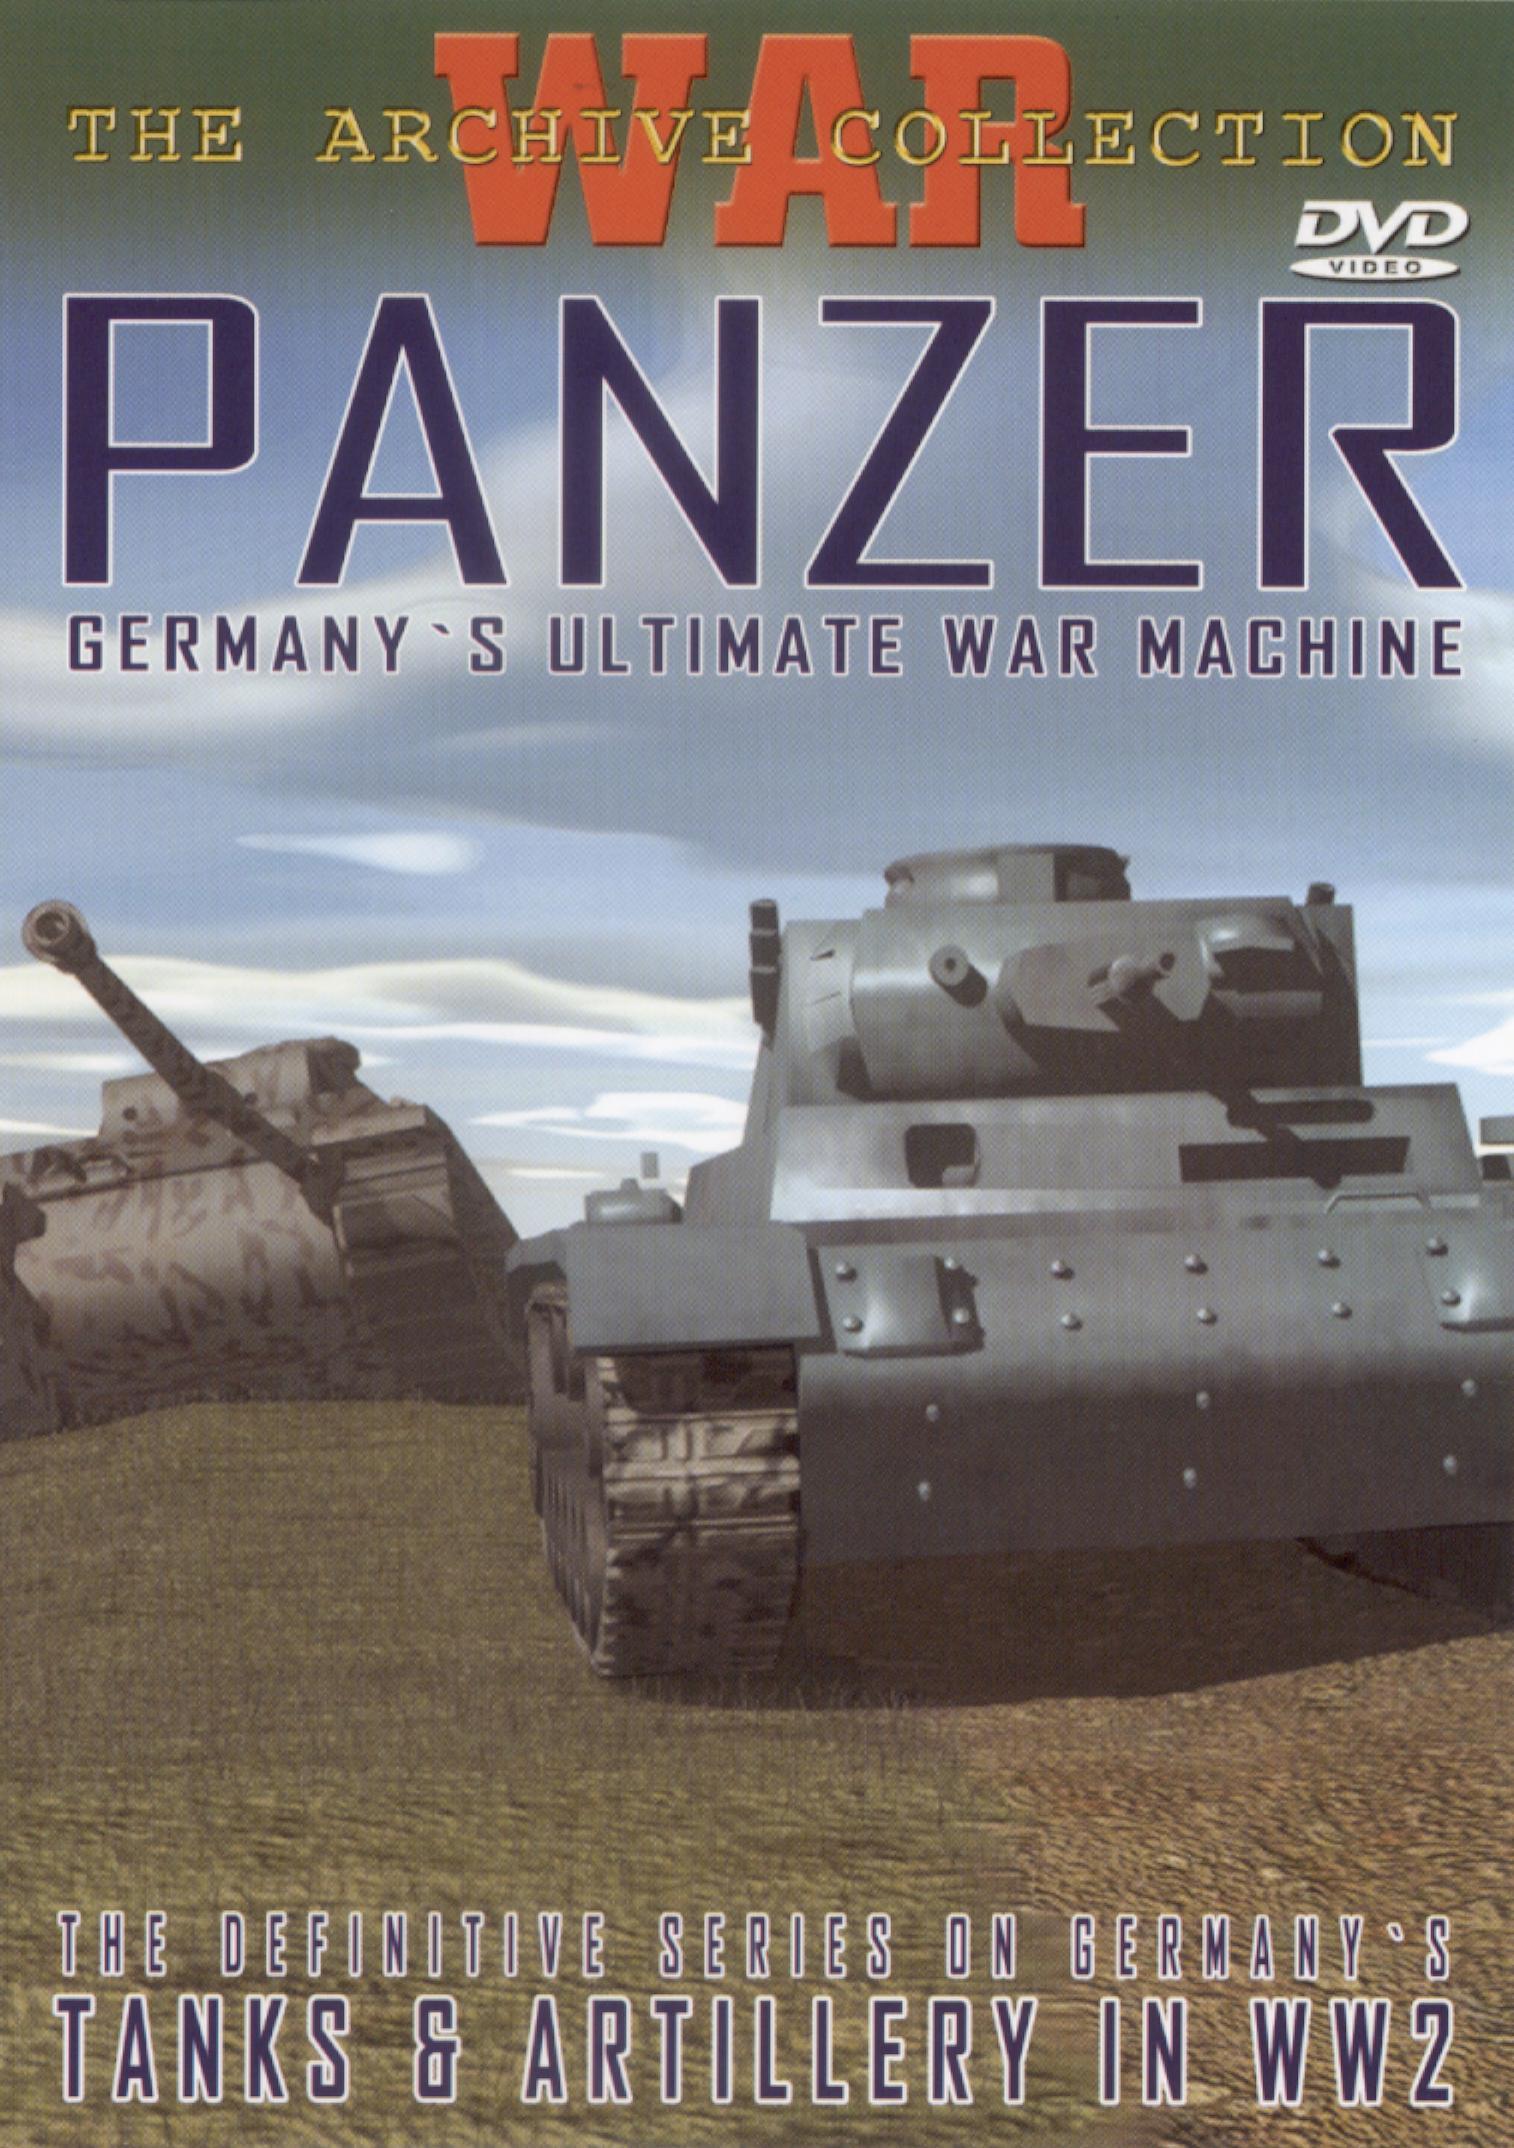 Panzer - Germany's Ultimate War Machine